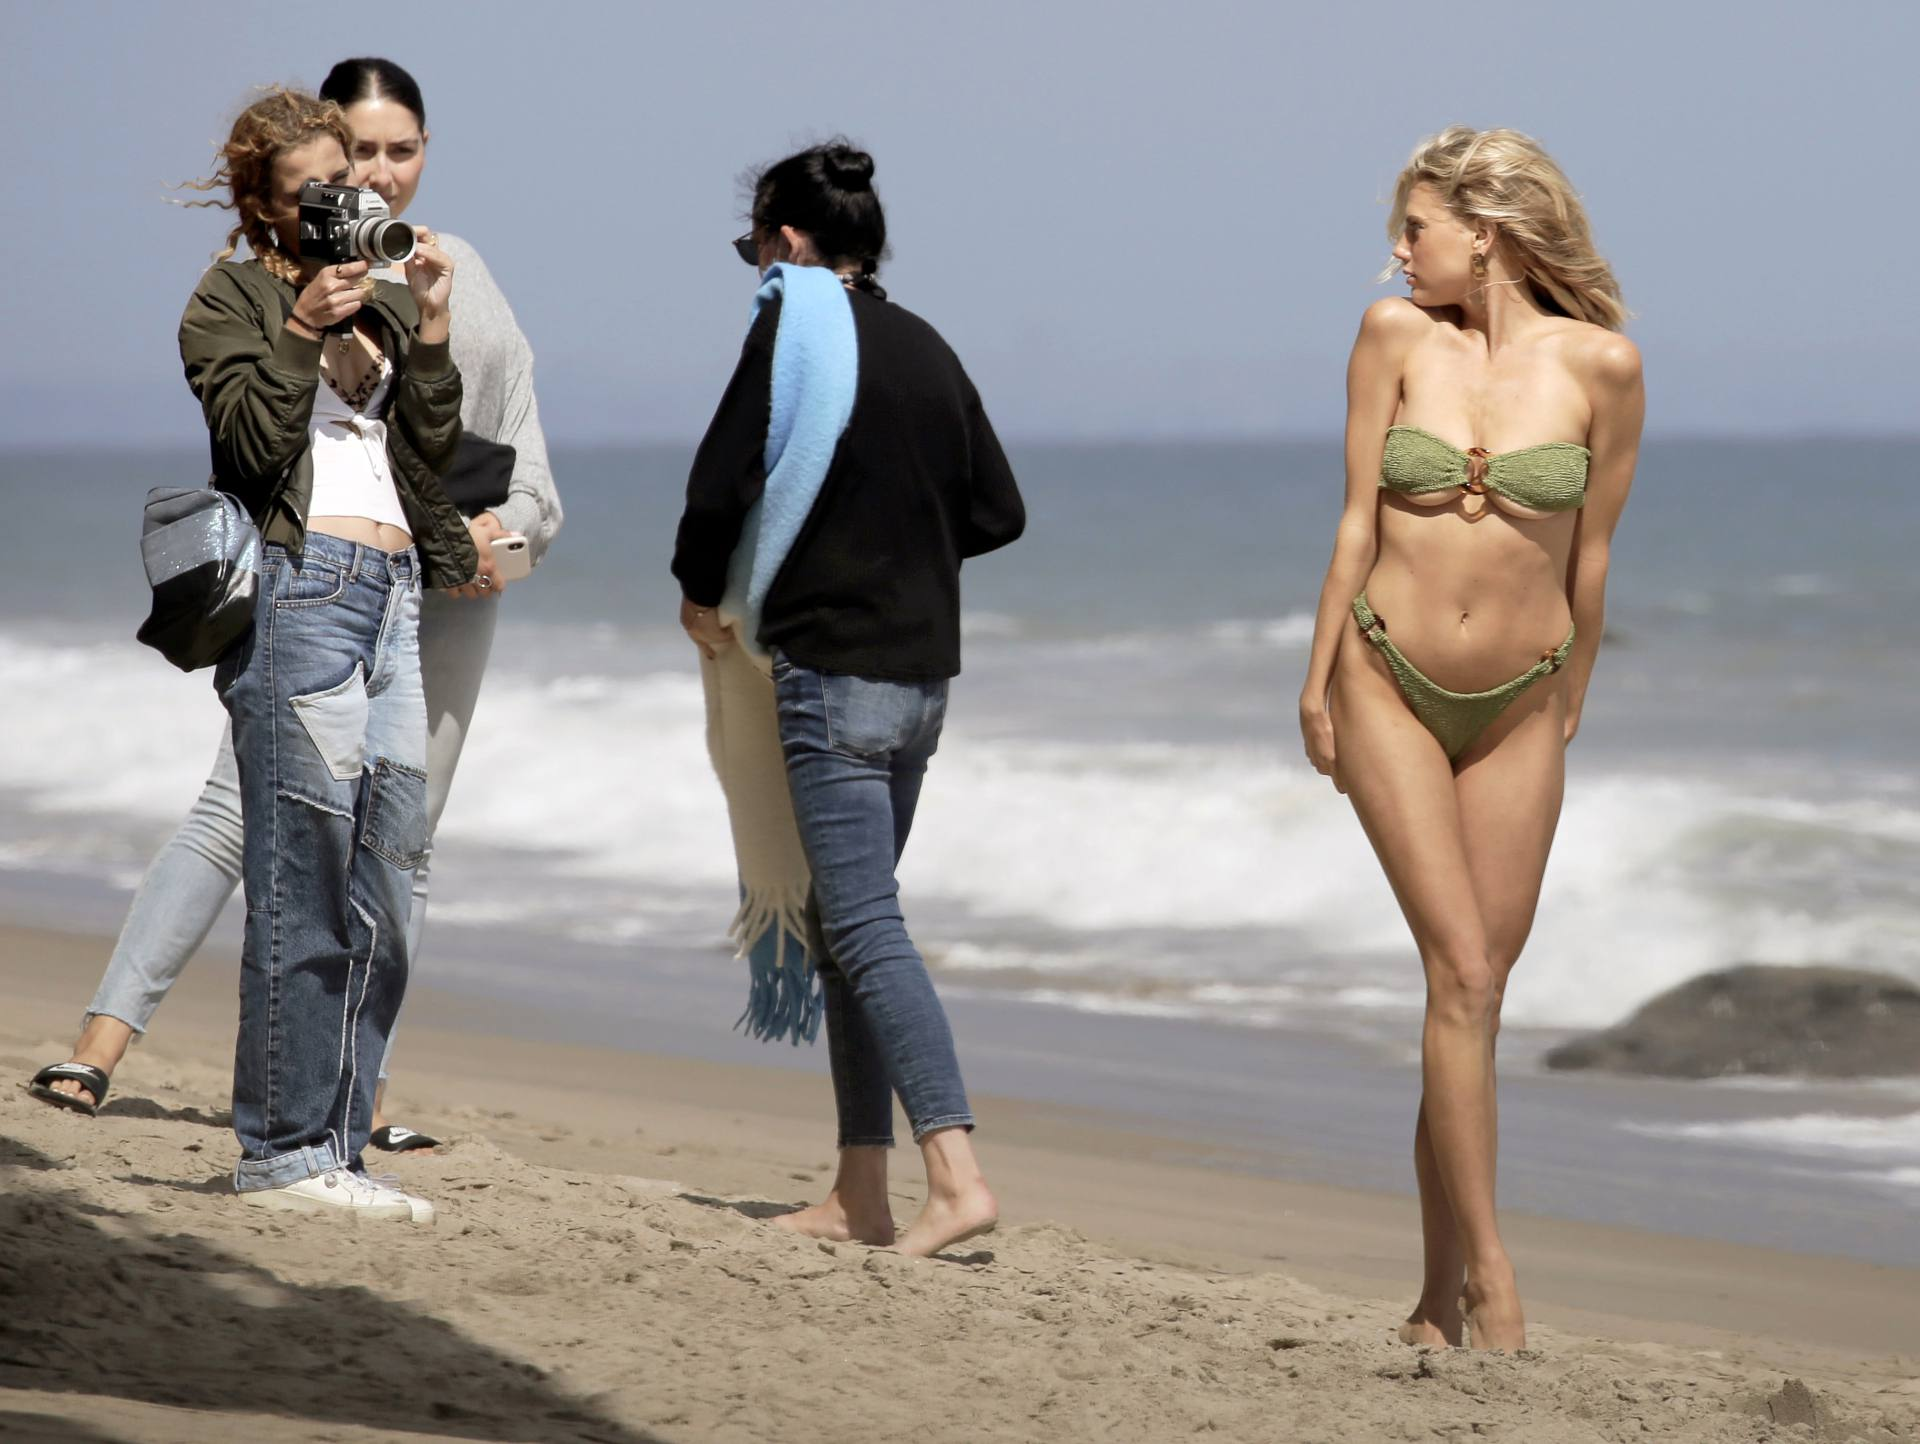 Charlotte Mckinney – Sexy Boobs In Tiny Bikini On The Beach In Los Angeles 0006